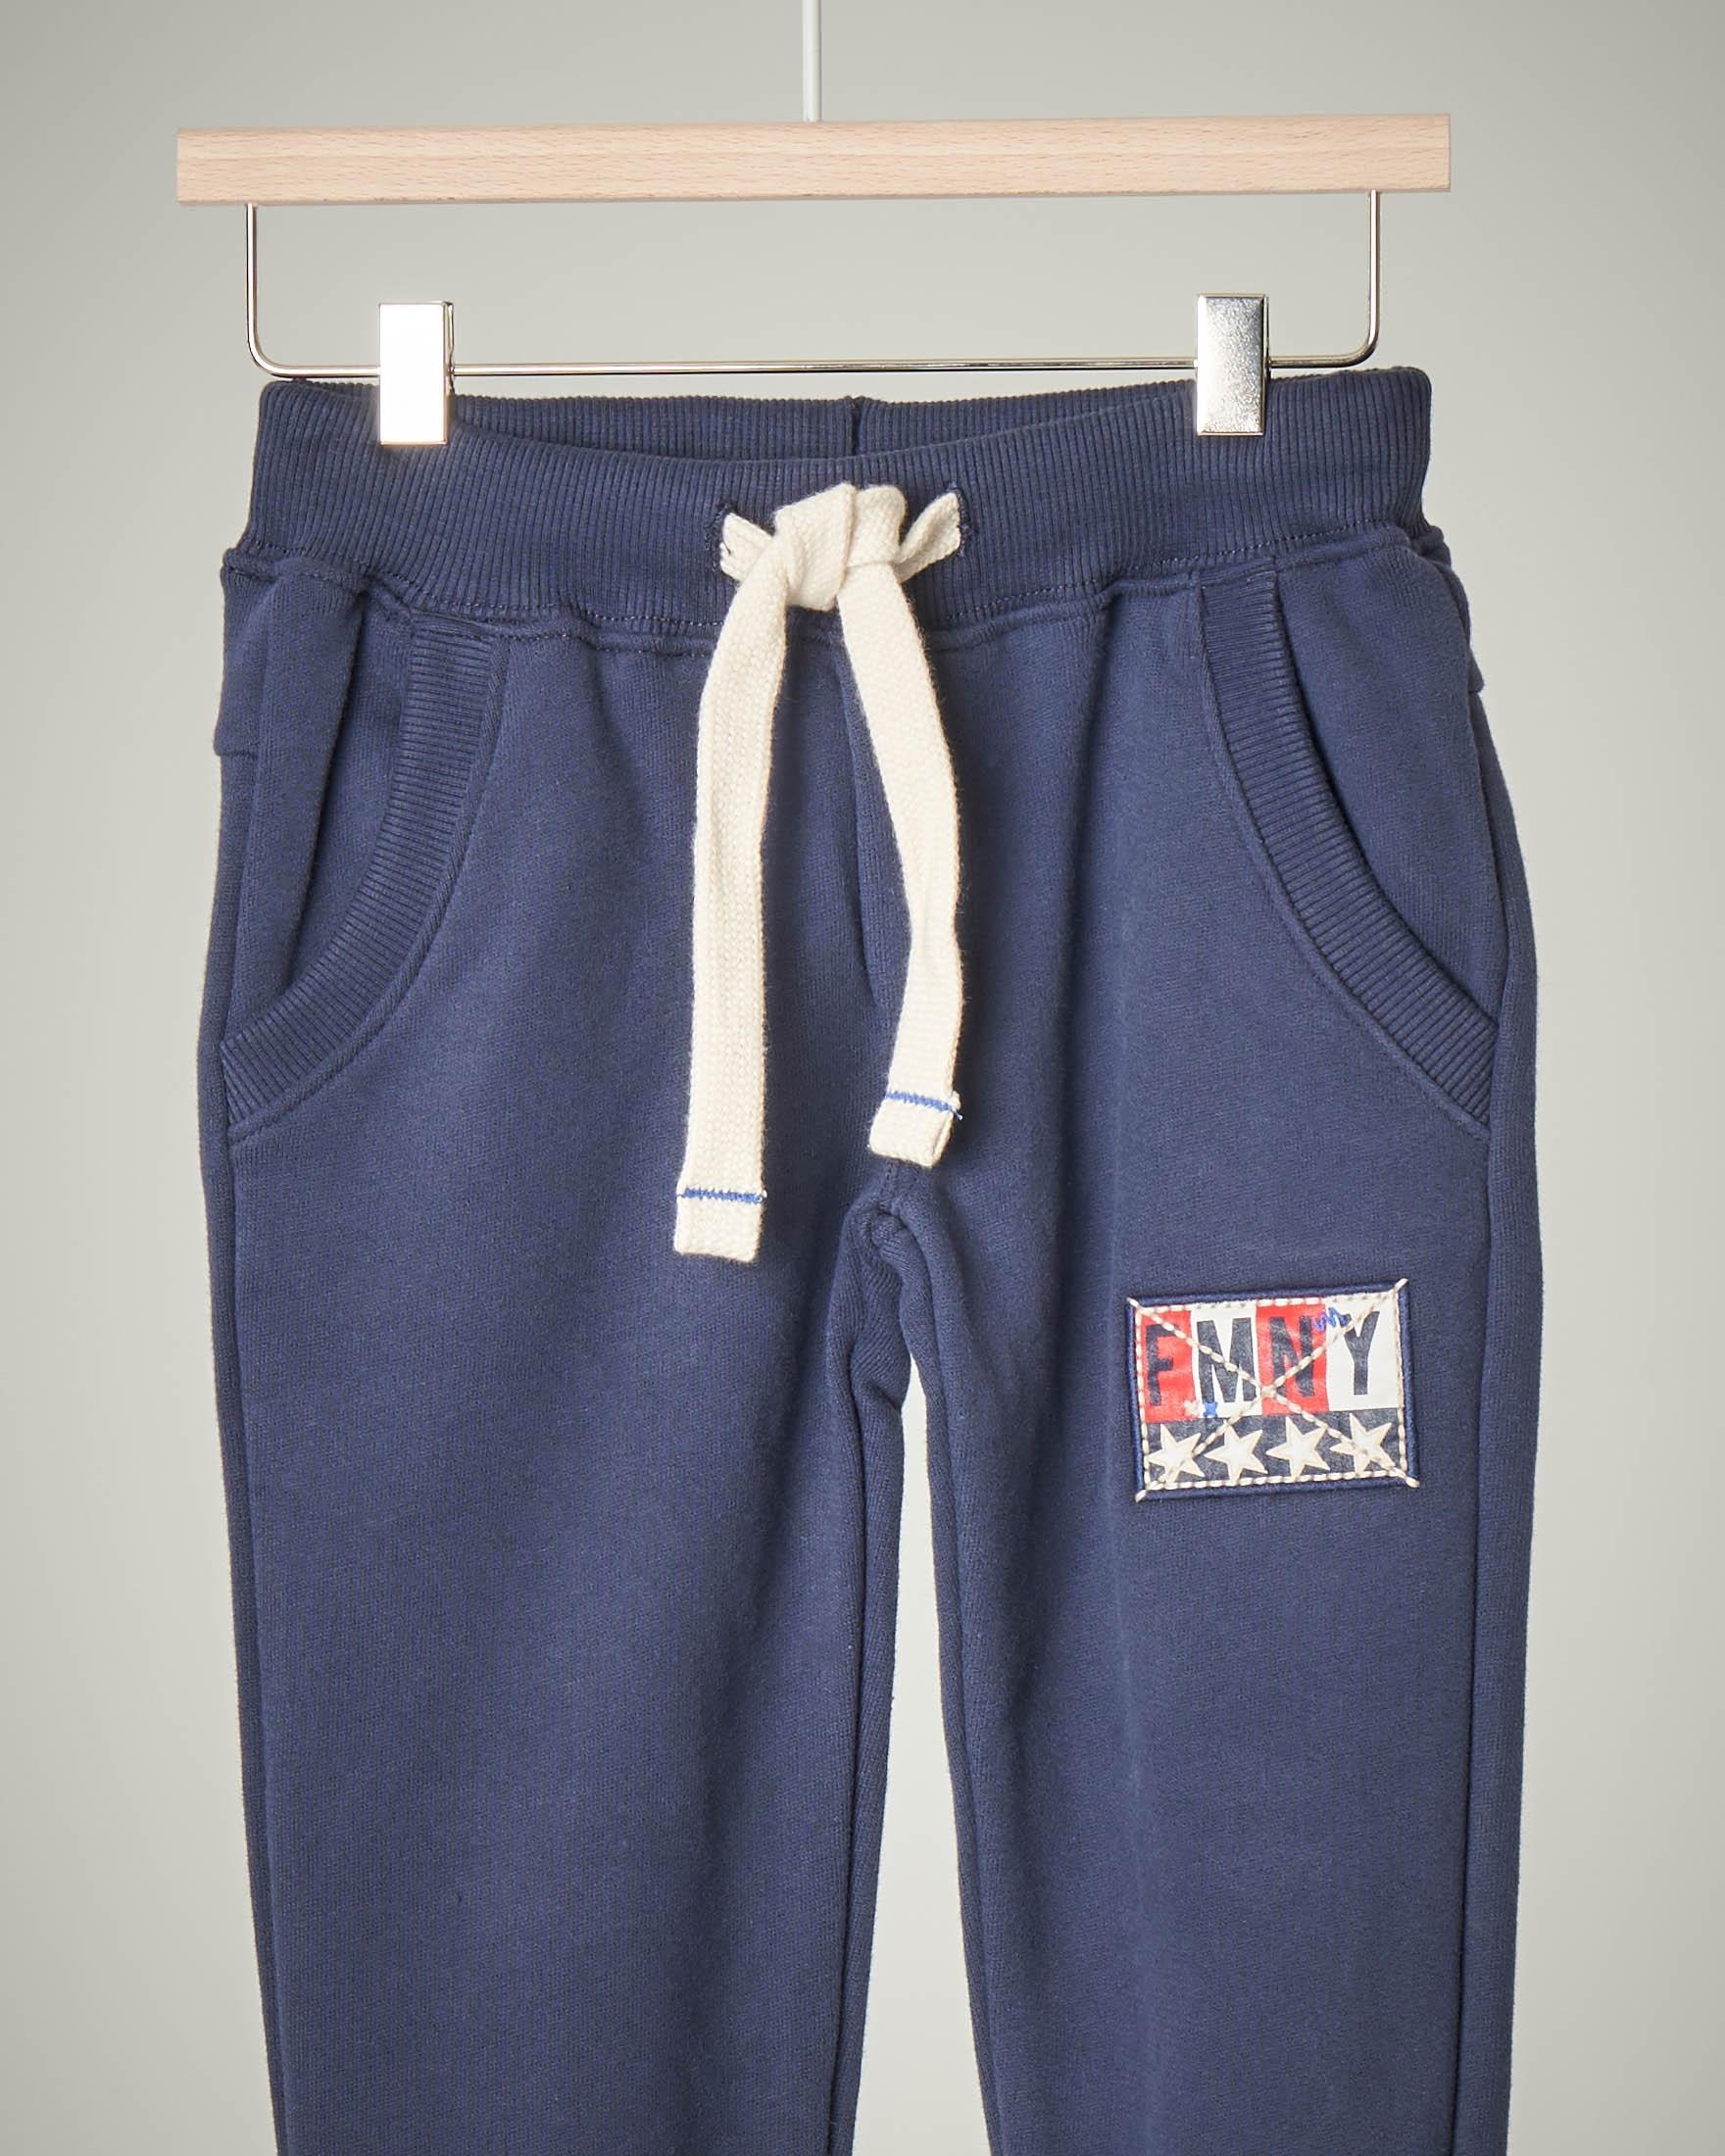 Pantalone blu felpa 2-7 anni